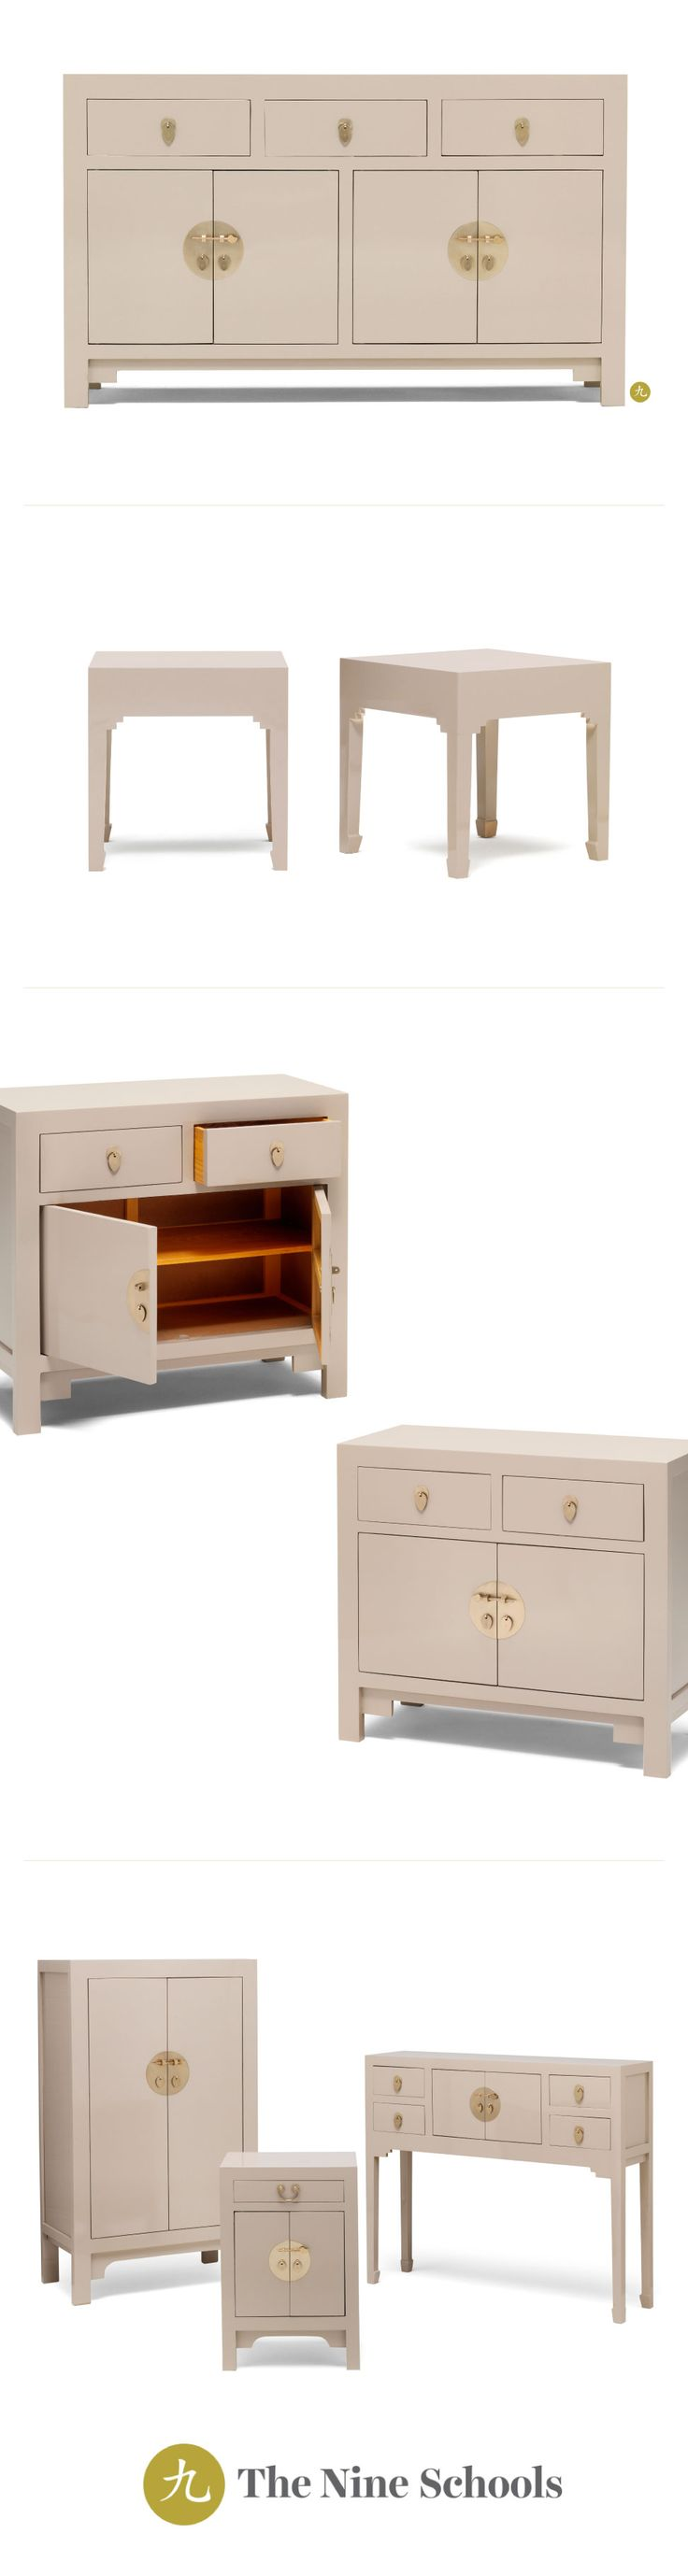 Chinese Design, Oriental Furniture, Schools, Colleges